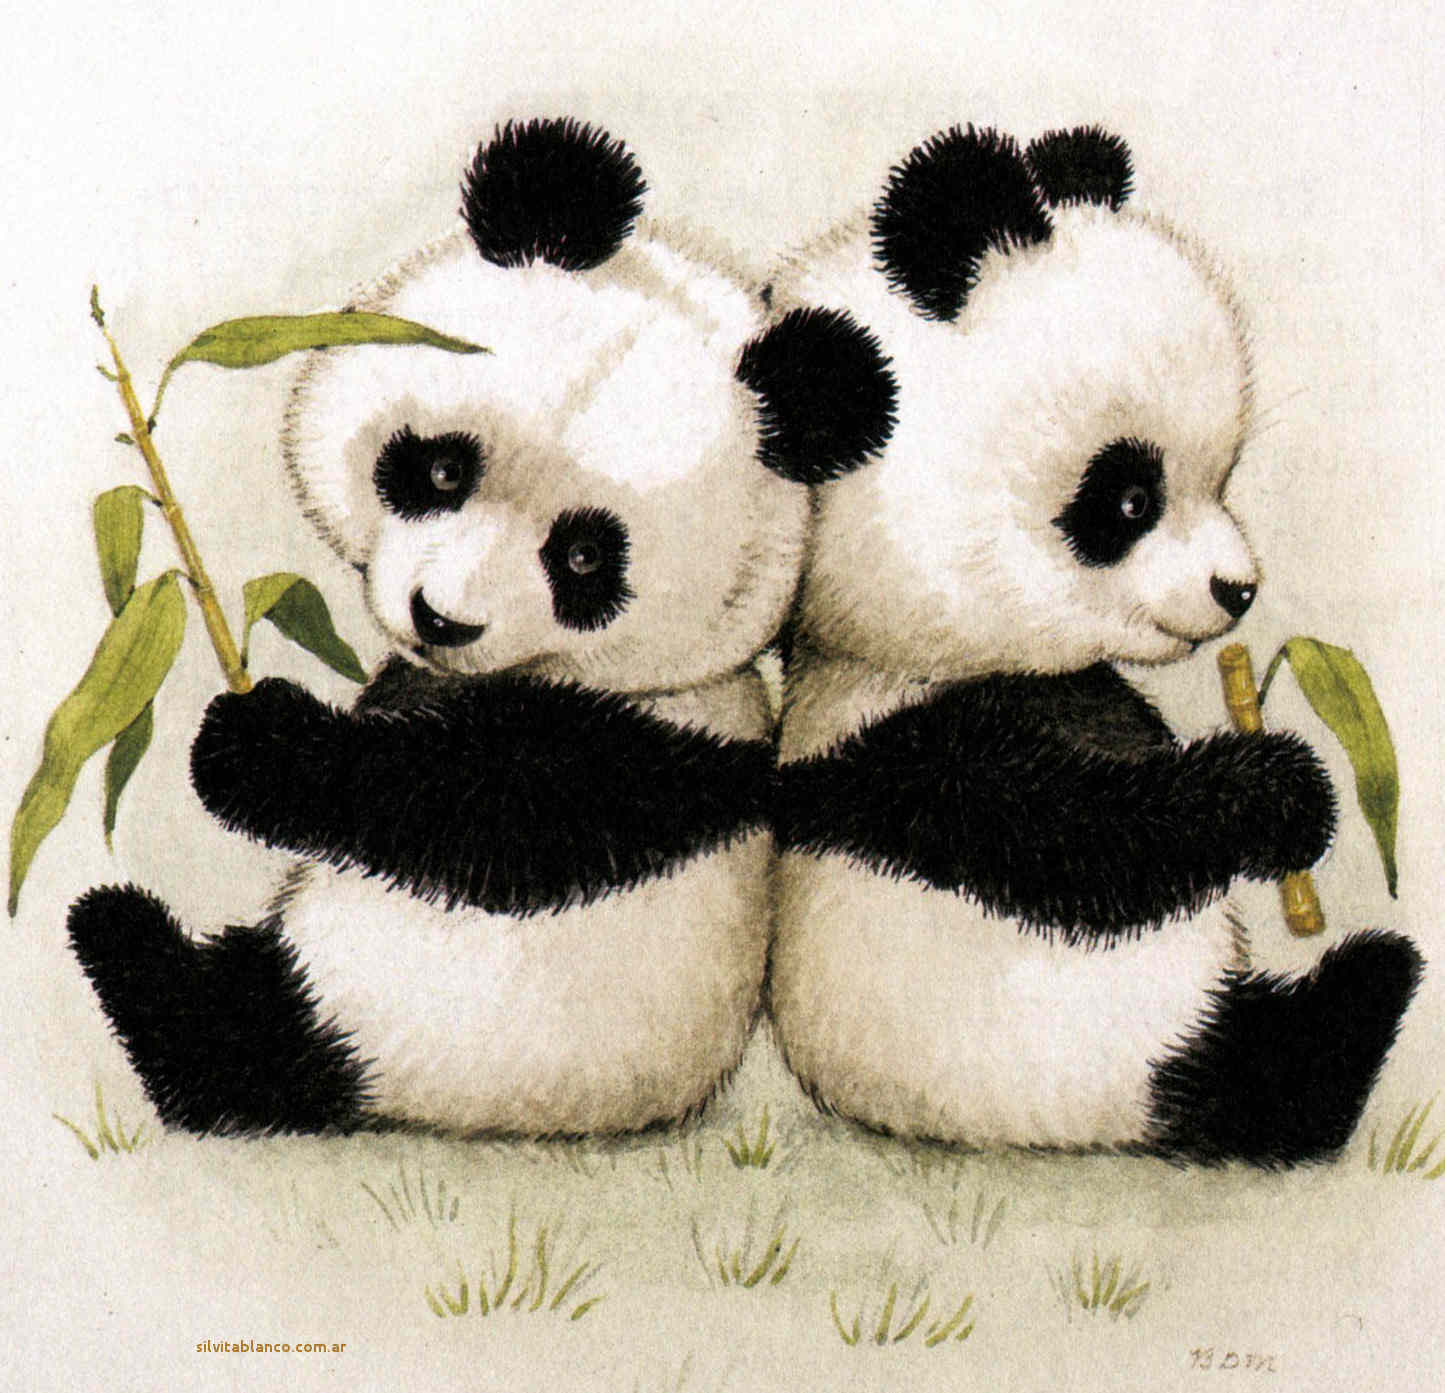 Super Oso panda especie en peligro de extinción QK02